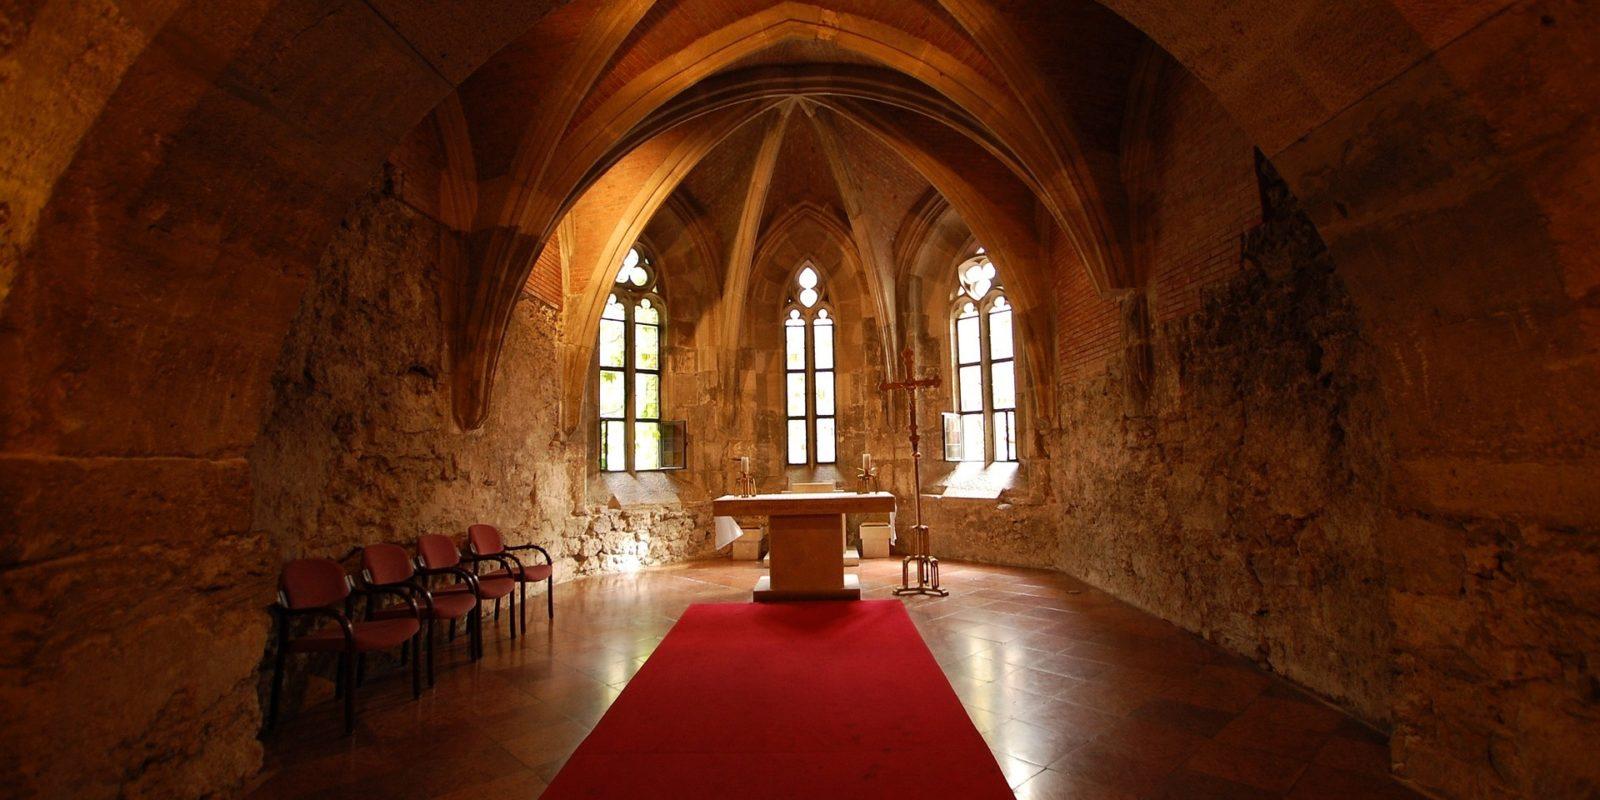 INTERIOR CHURCH-BUDA CASTLE, BUDAPEST, HUNGARY